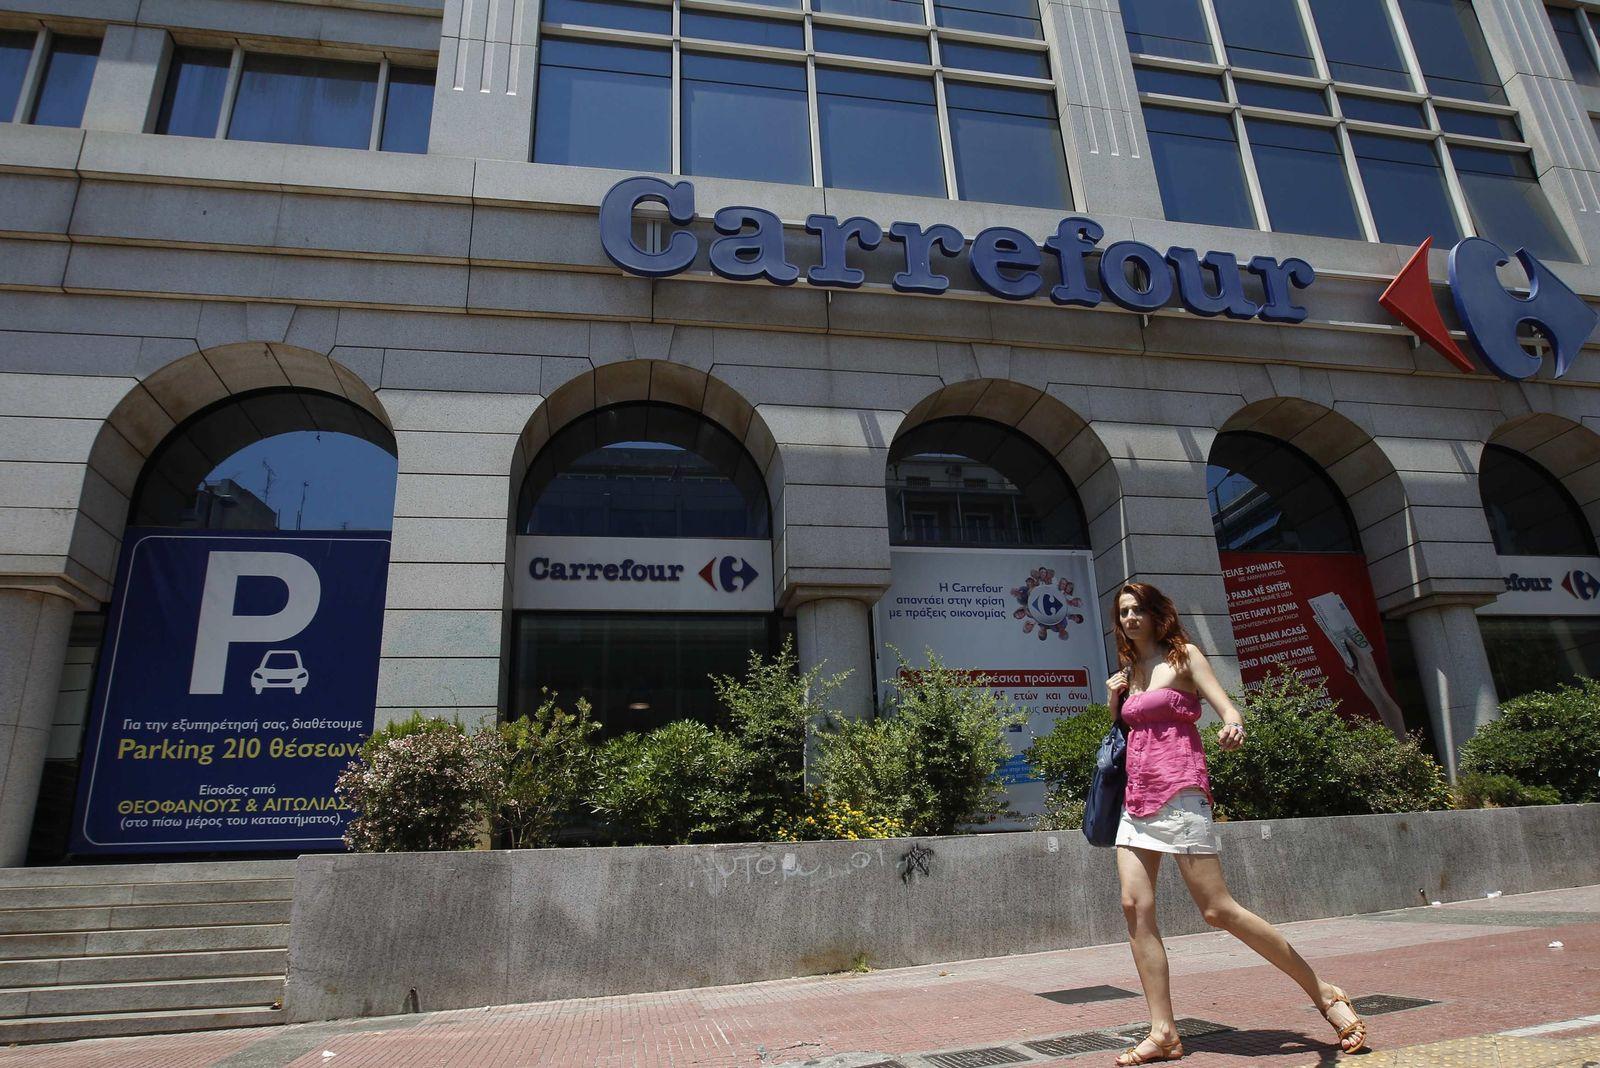 CARREFOUR-GREECE/ Carrefour